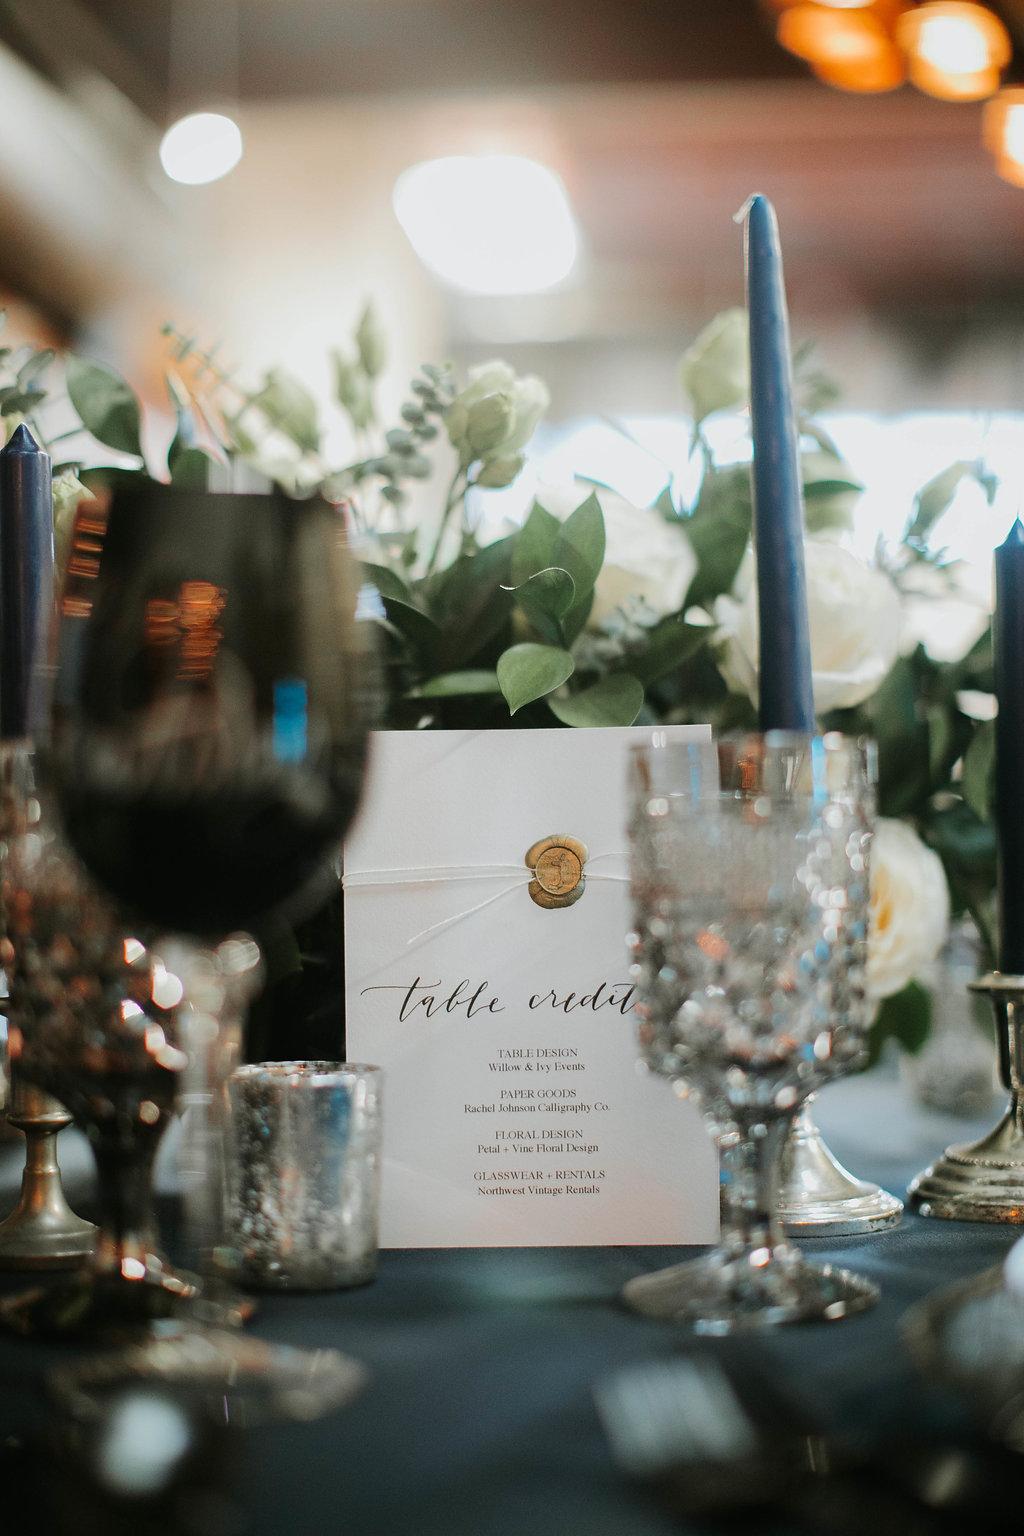 The_Big_Fake_wedding_Seattle_Within_sodo_wedding_by_Adina_Preston_Weddings_85.JPG